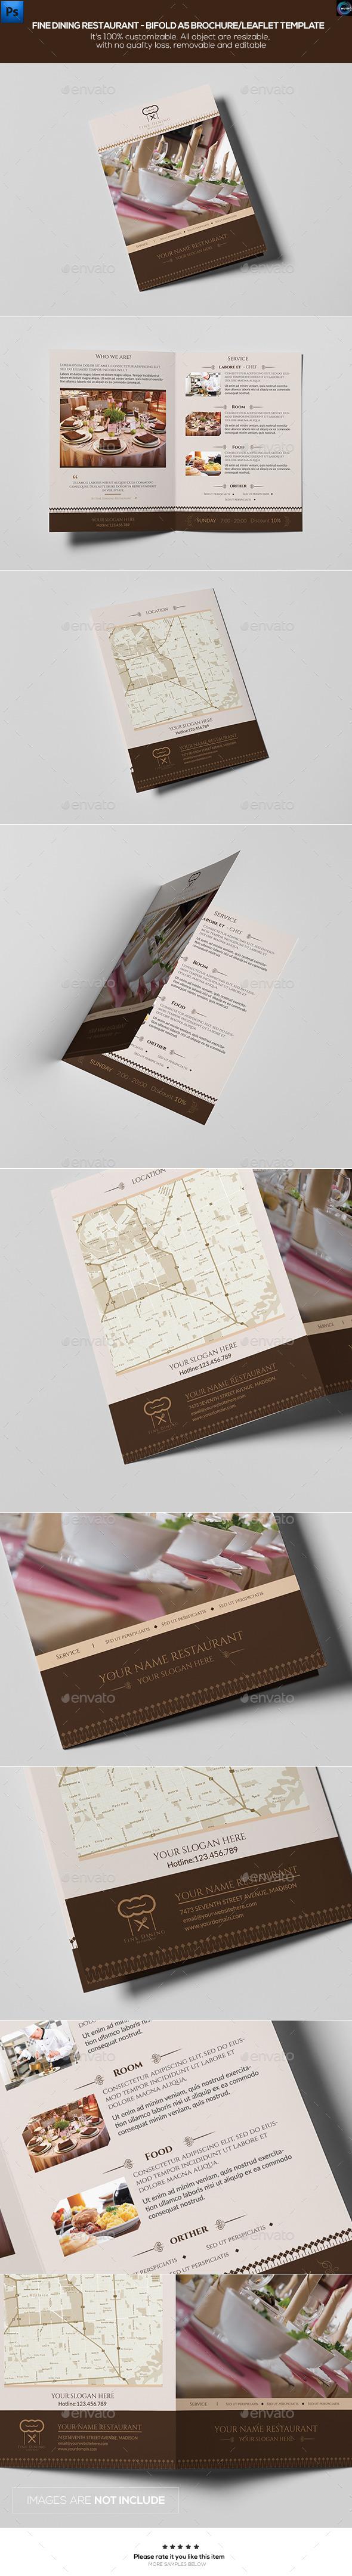 Fine Dining Restaurant-Bifold A5 Brochure Template - Informational Brochures